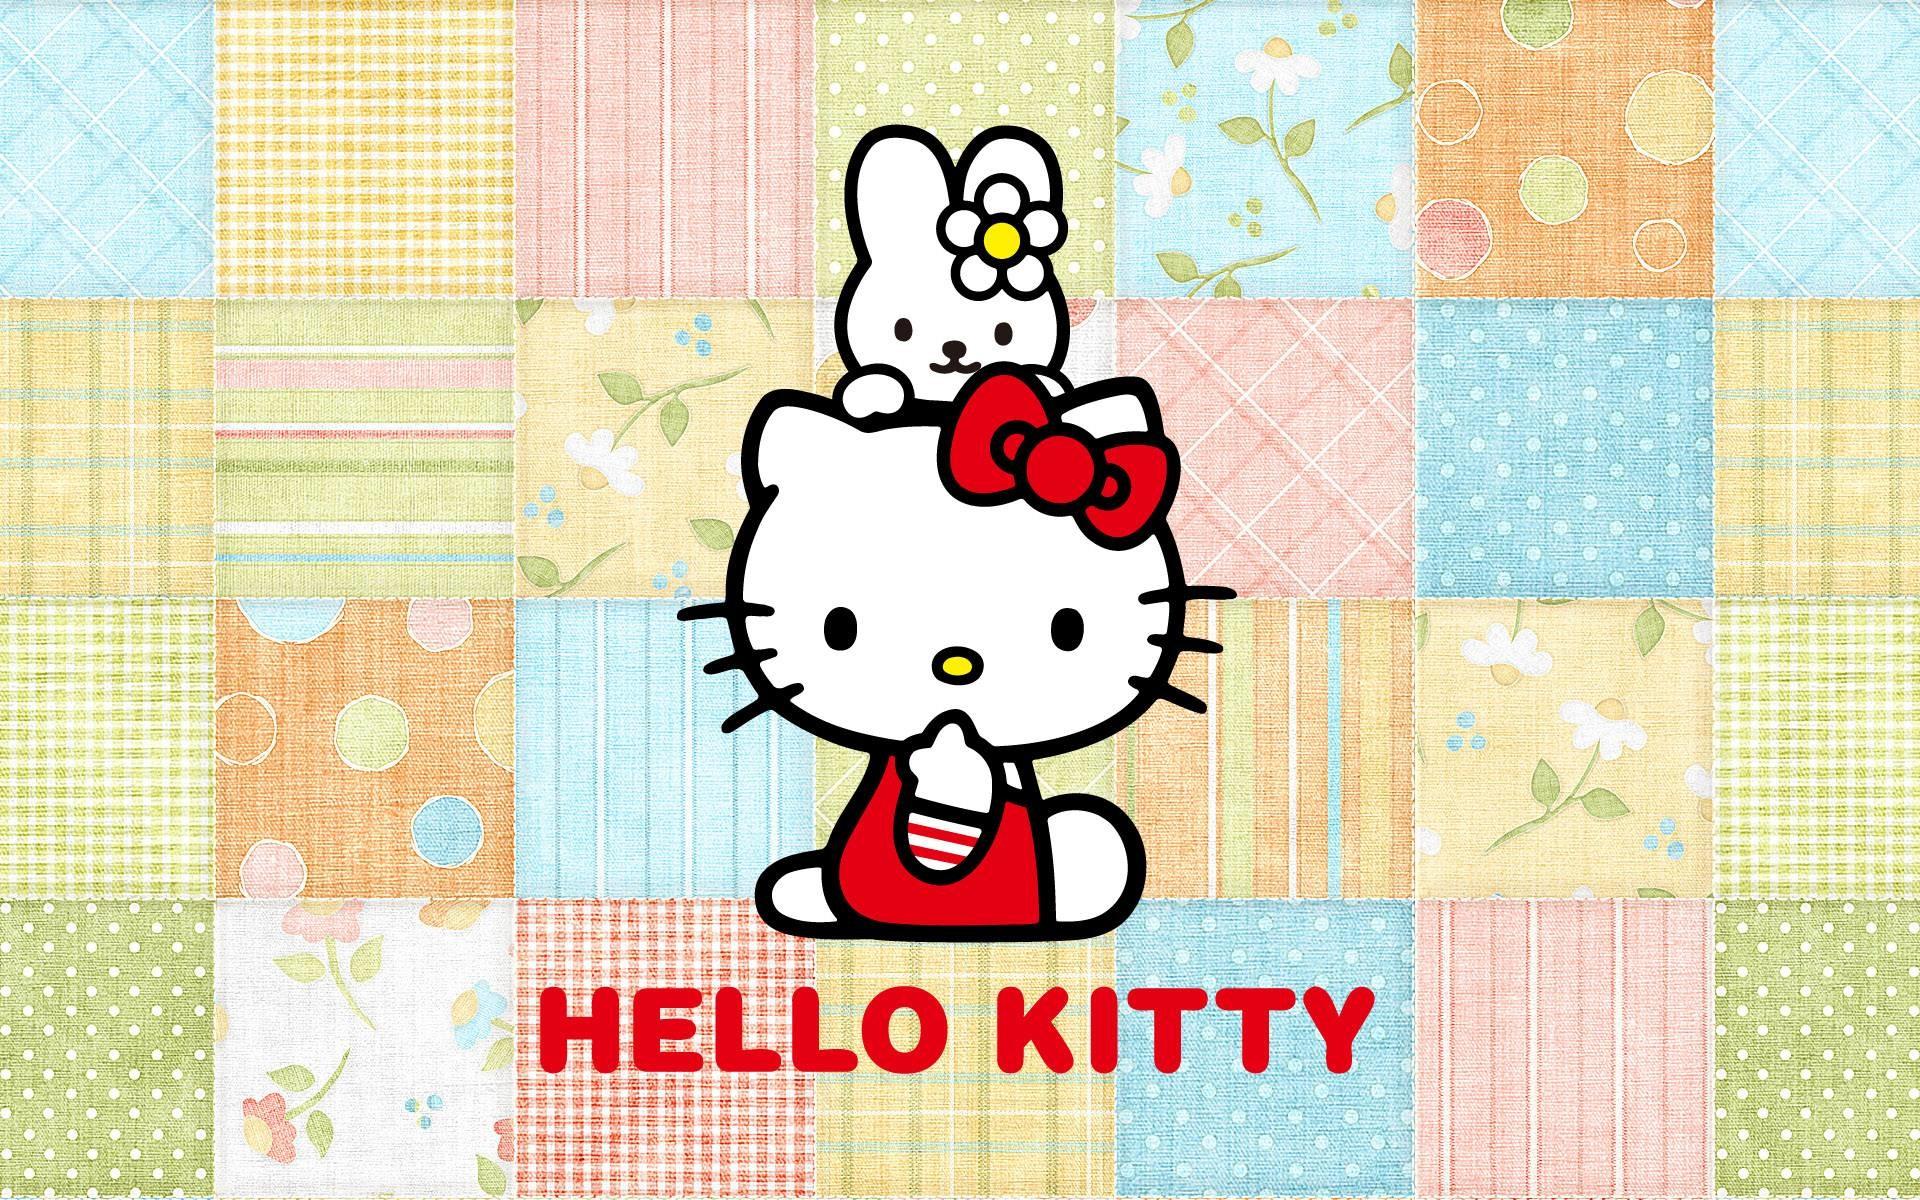 Amazing Wallpaper Hello Kitty Coffee - 1063107-full-size-hello-kitty-wallpaper-desktop-1920x1200  Image_20440.jpg